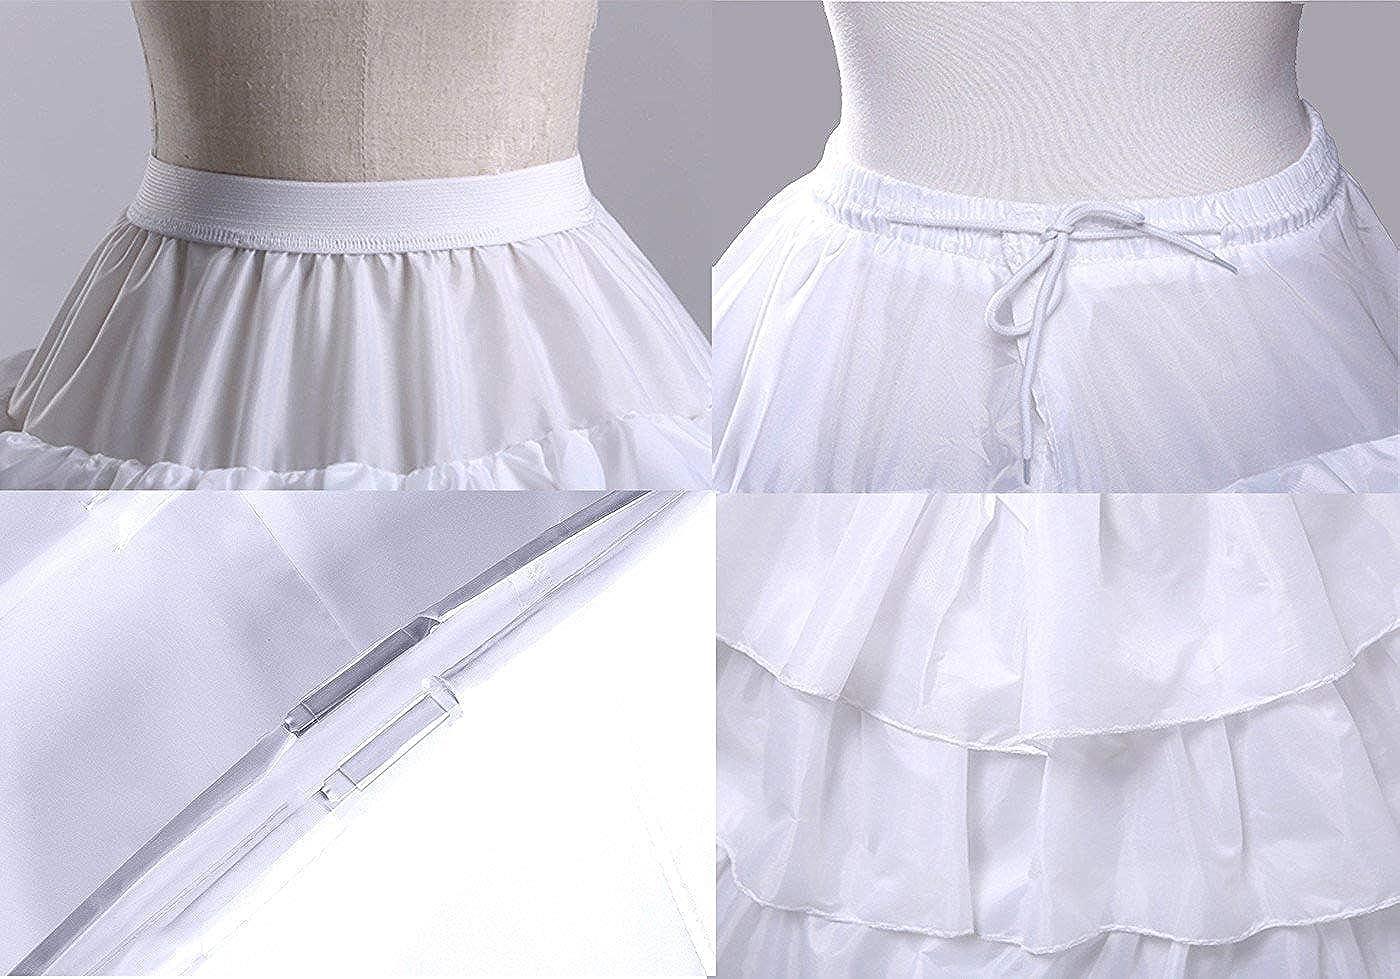 VERNASSA Gonna a Campana di Abiti da Ballo 4-Hoop Slip Crinoline Underskirt per Donna